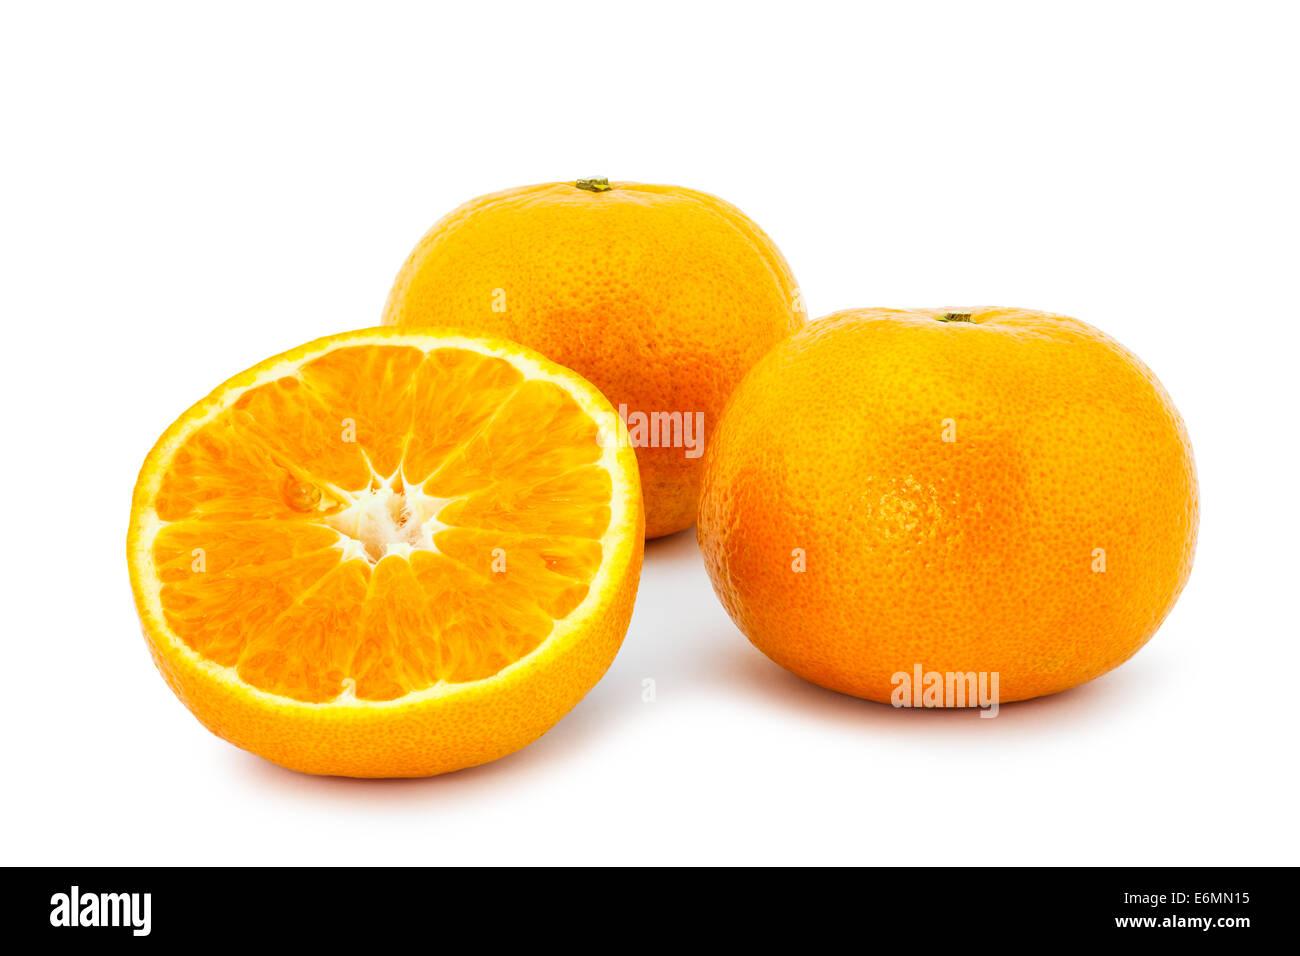 Closeup of oranges isolated on white background - Stock Image